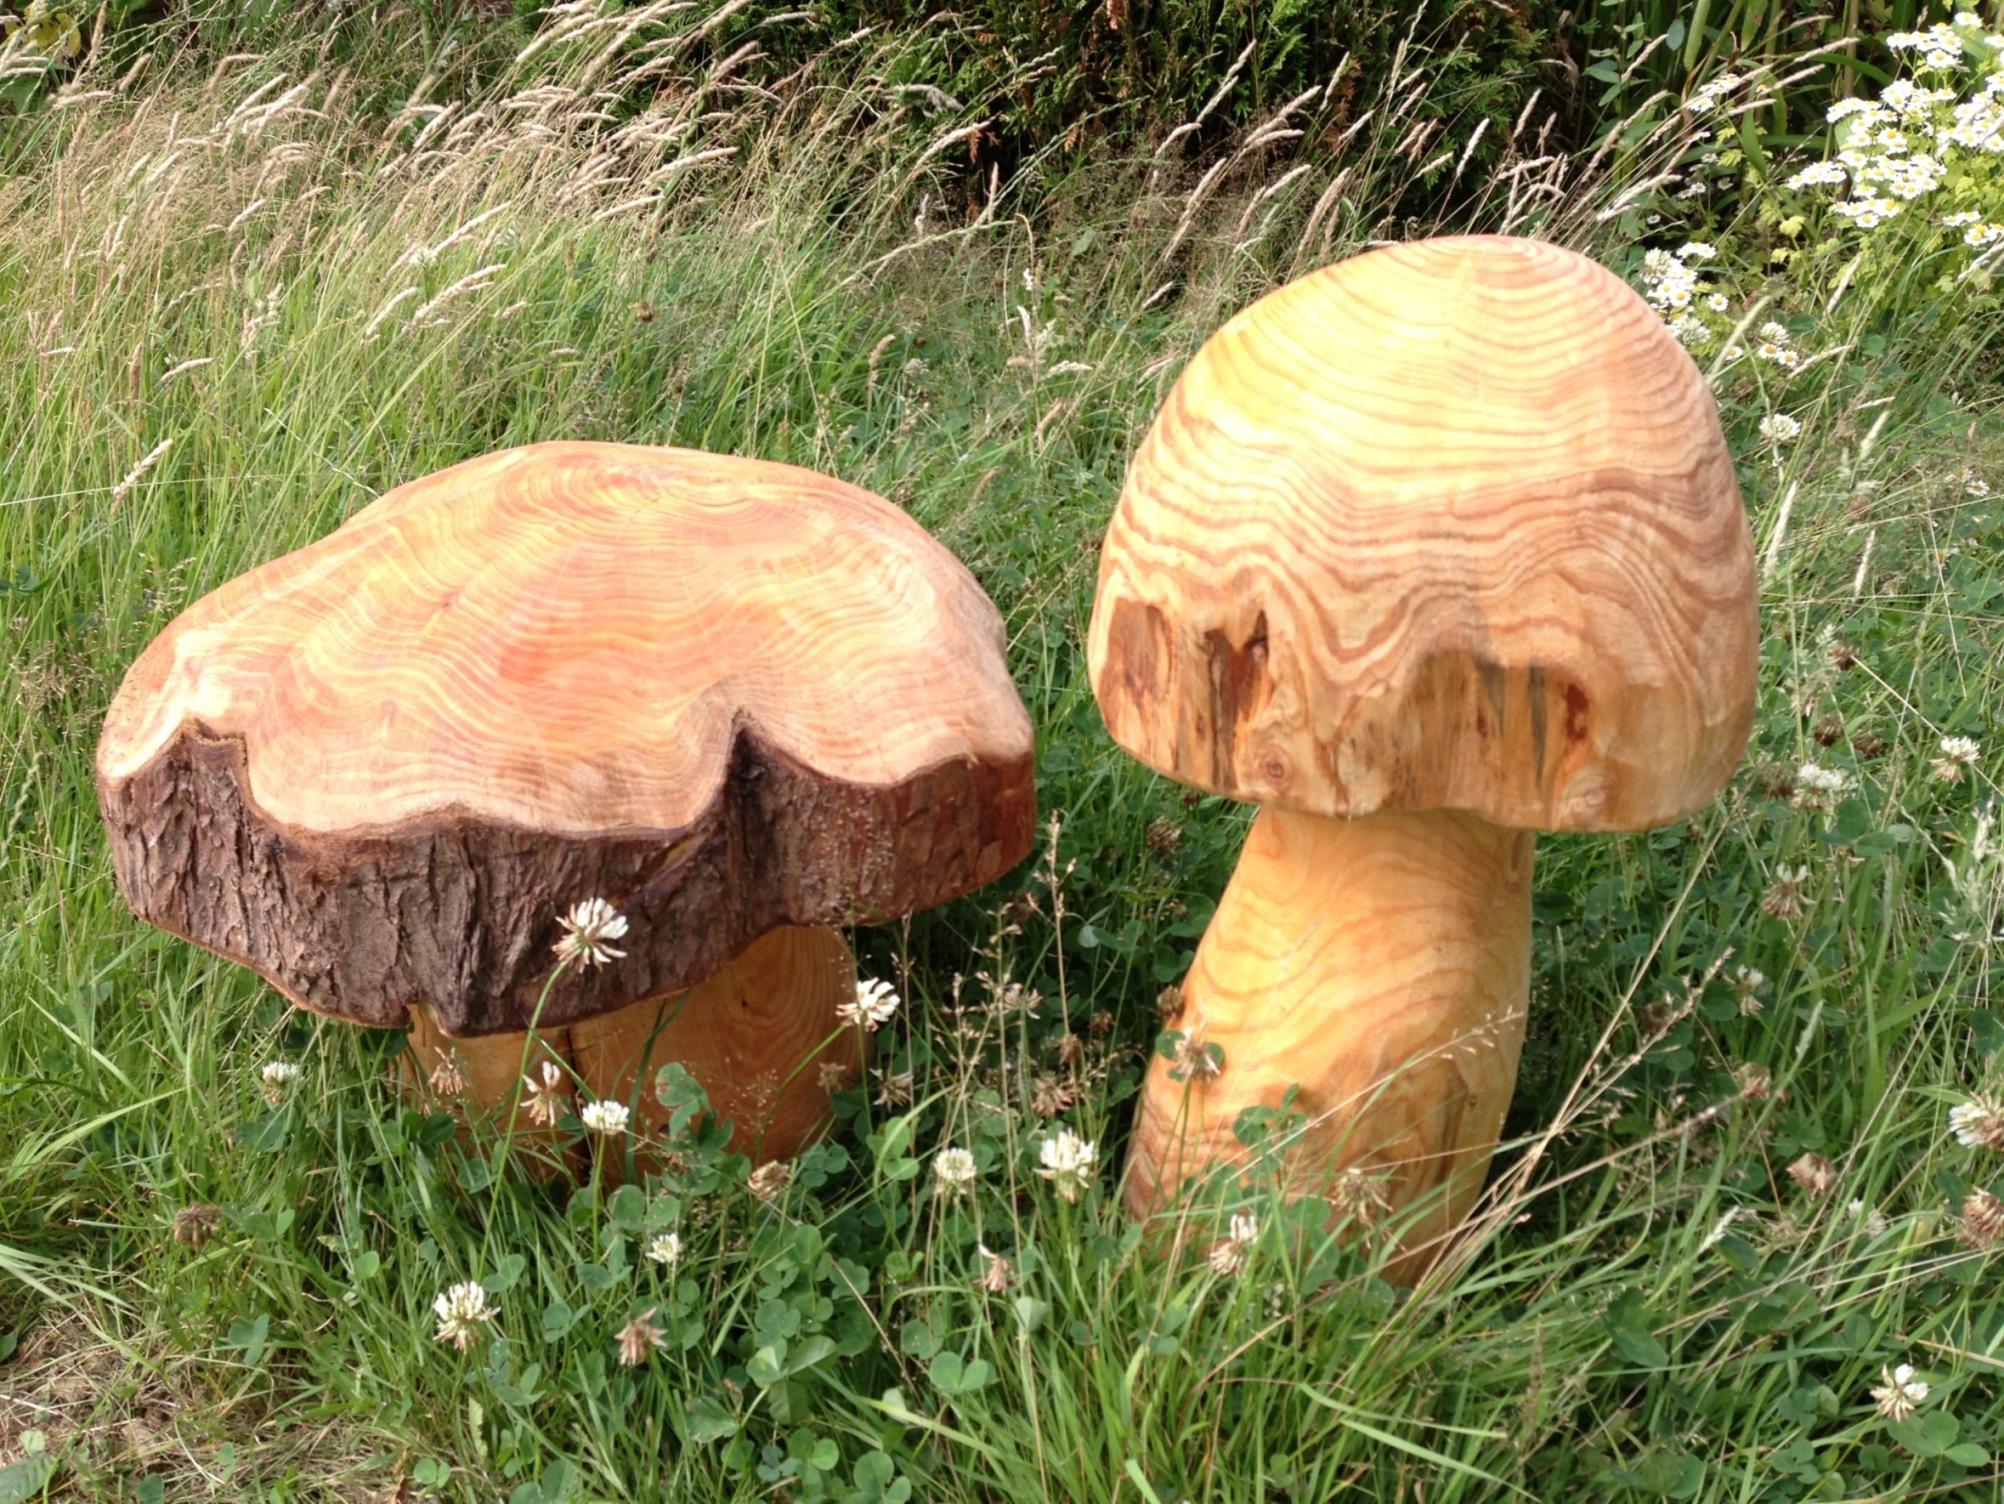 20150720 Mushrooms.JPG